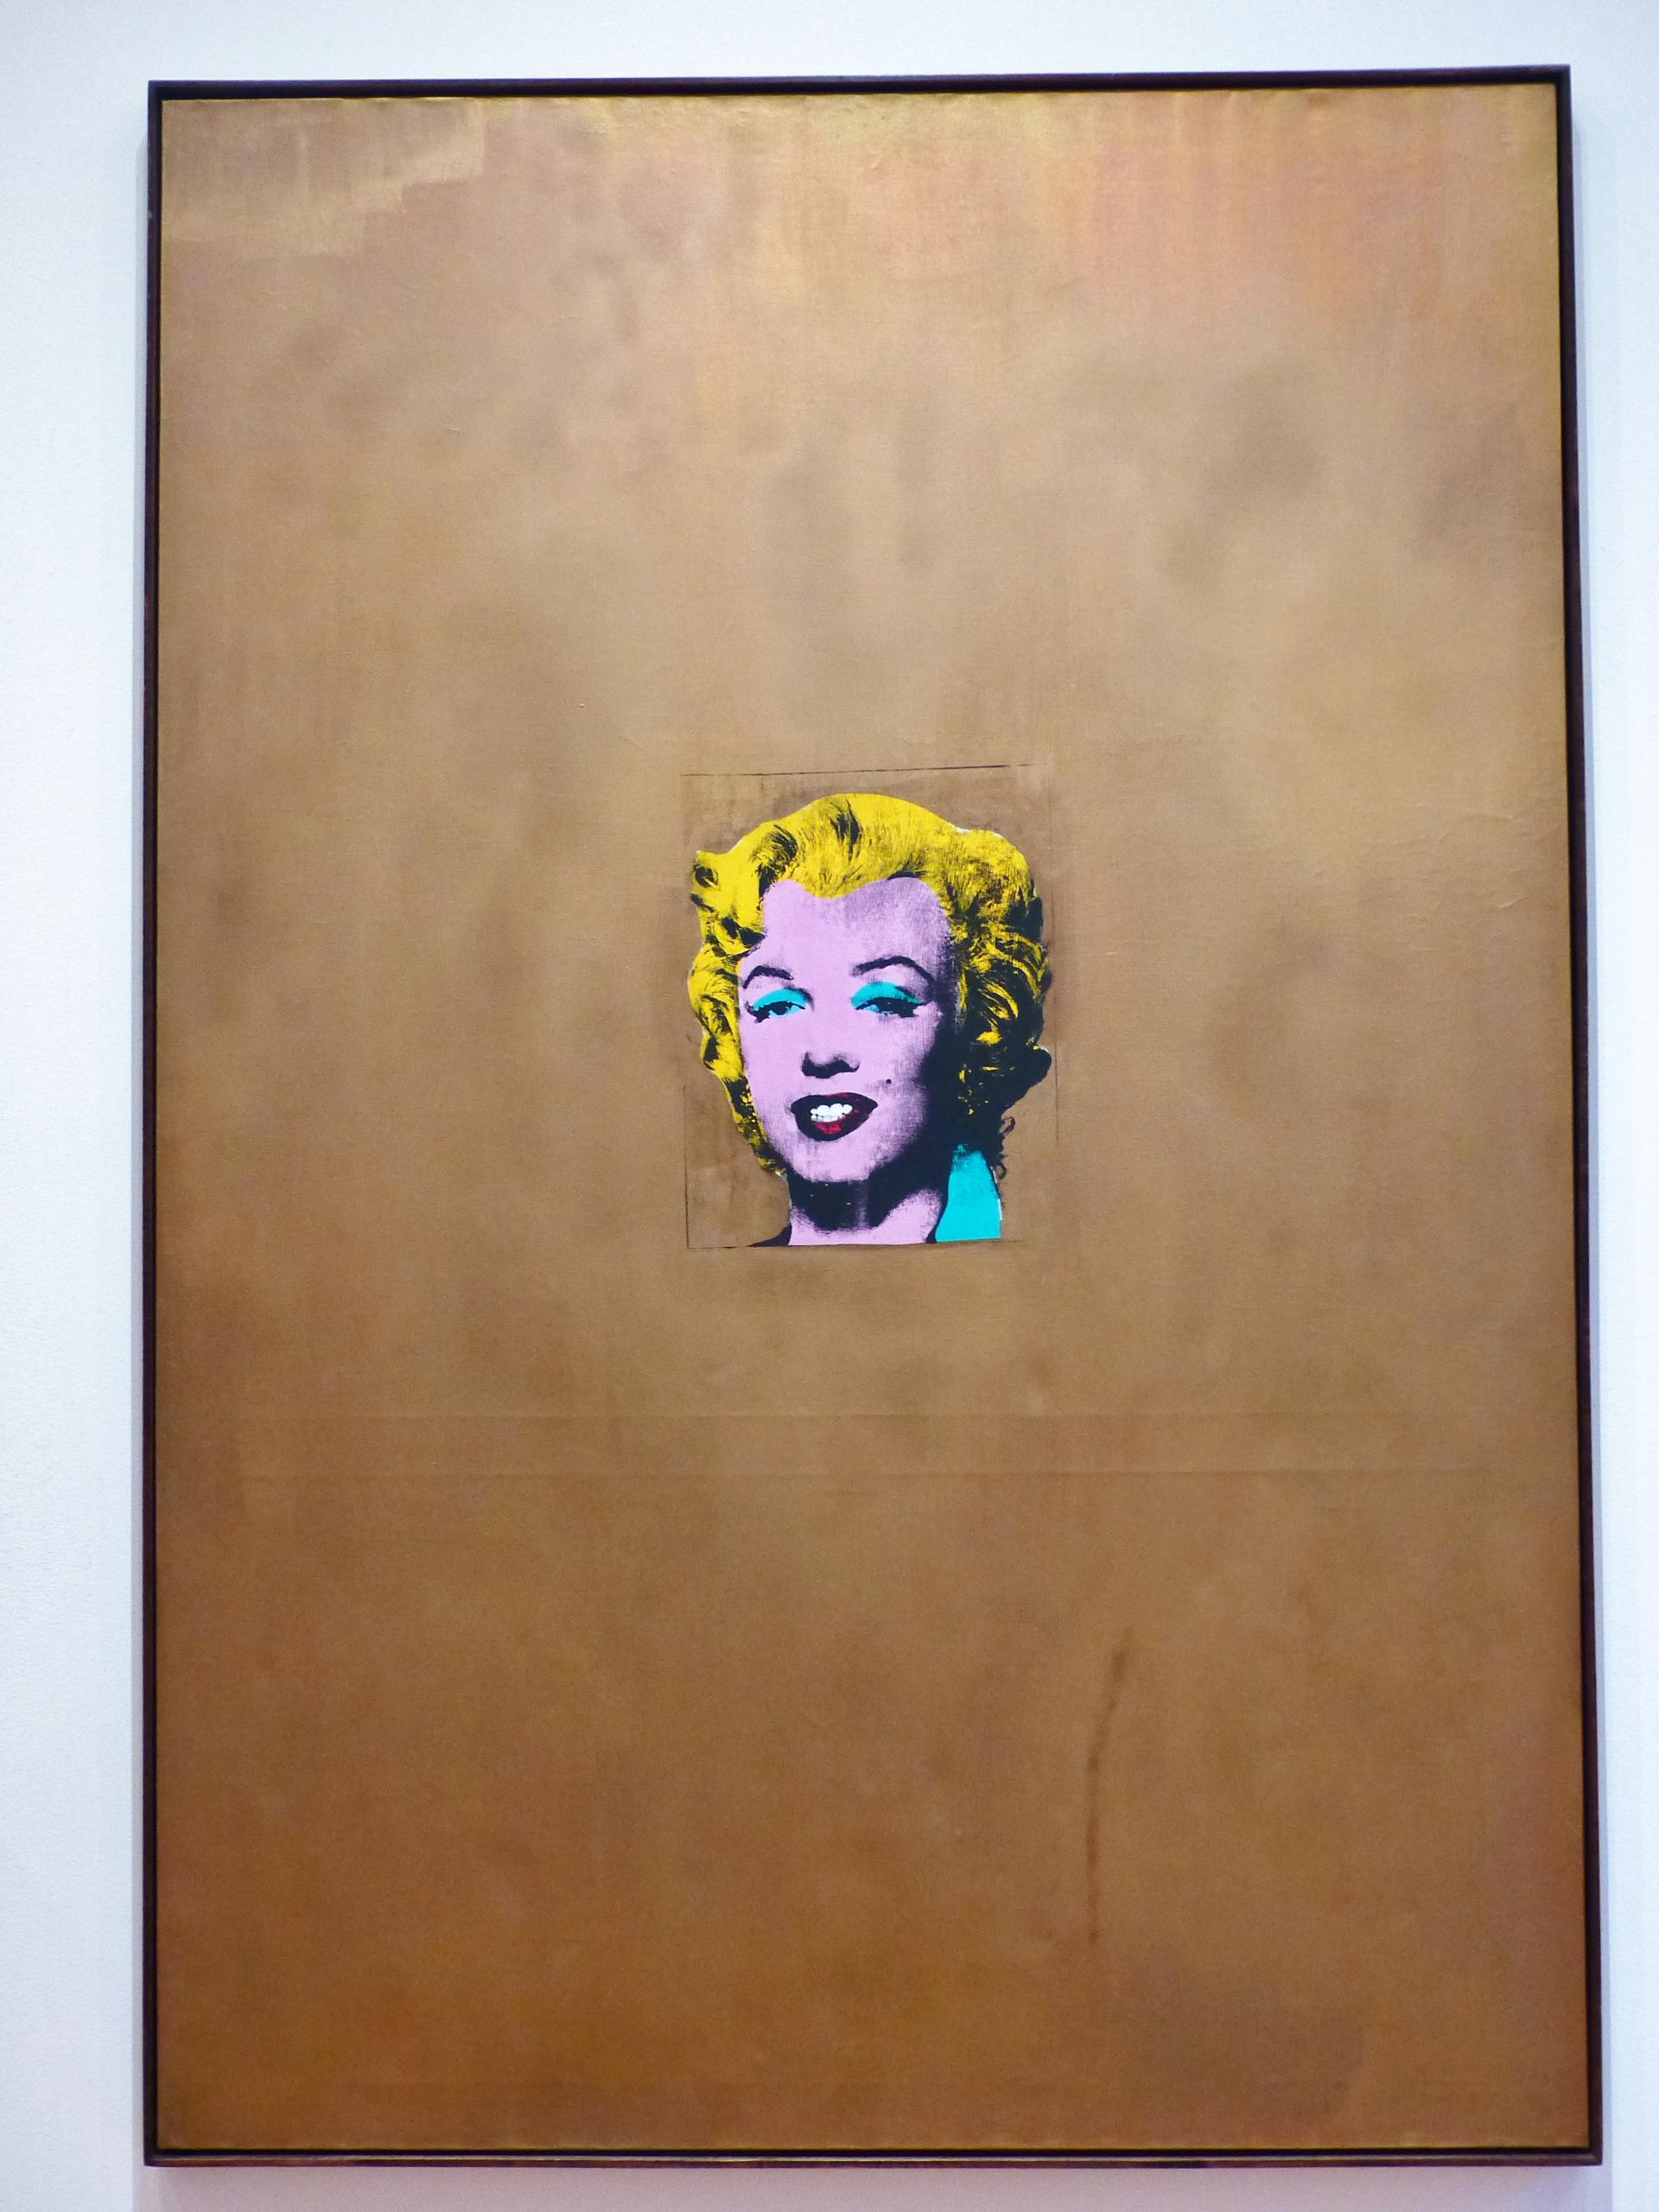 MoMA - Gold Marilyn Monroe, Warhol